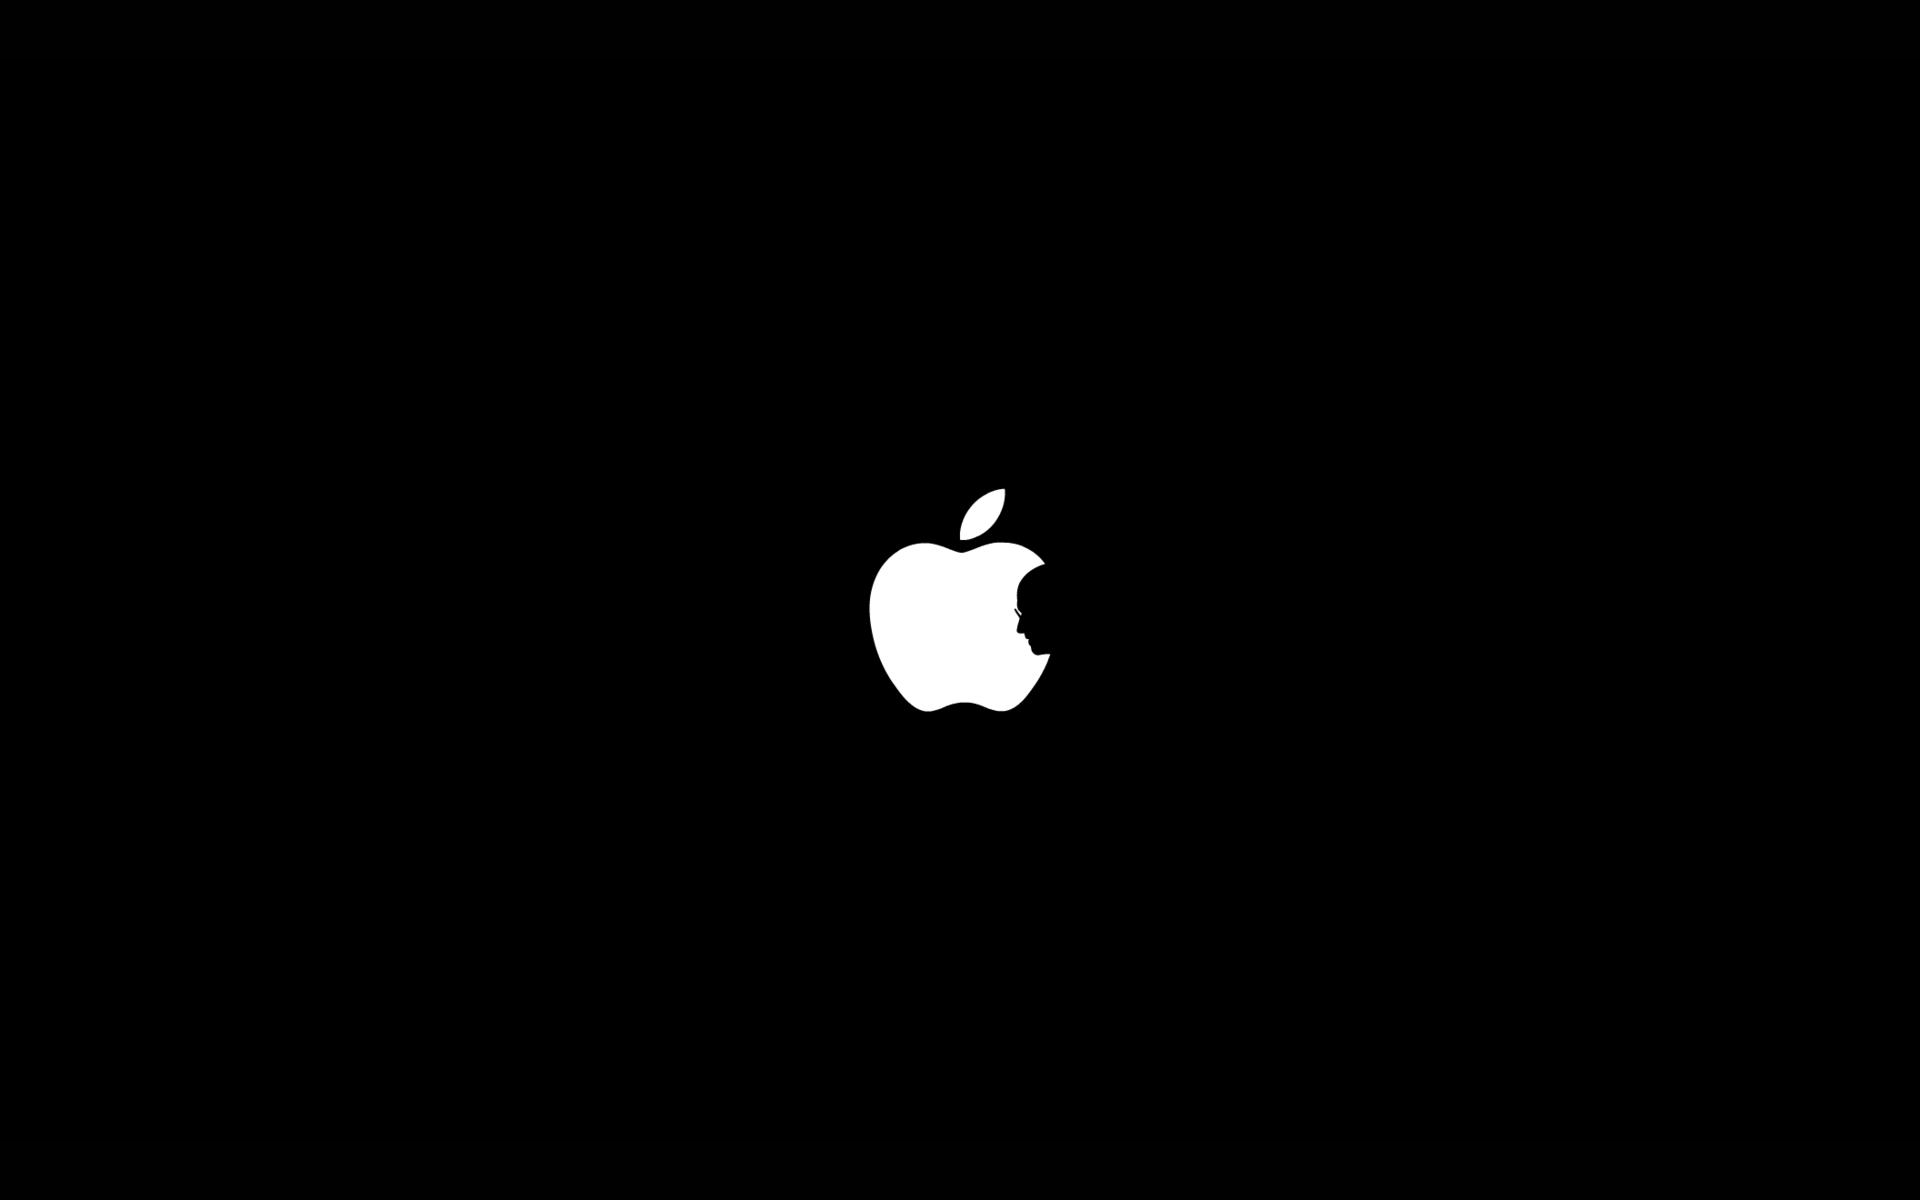 Apple Logo Wallpapers   Full HD wallpaper search 1920x1200